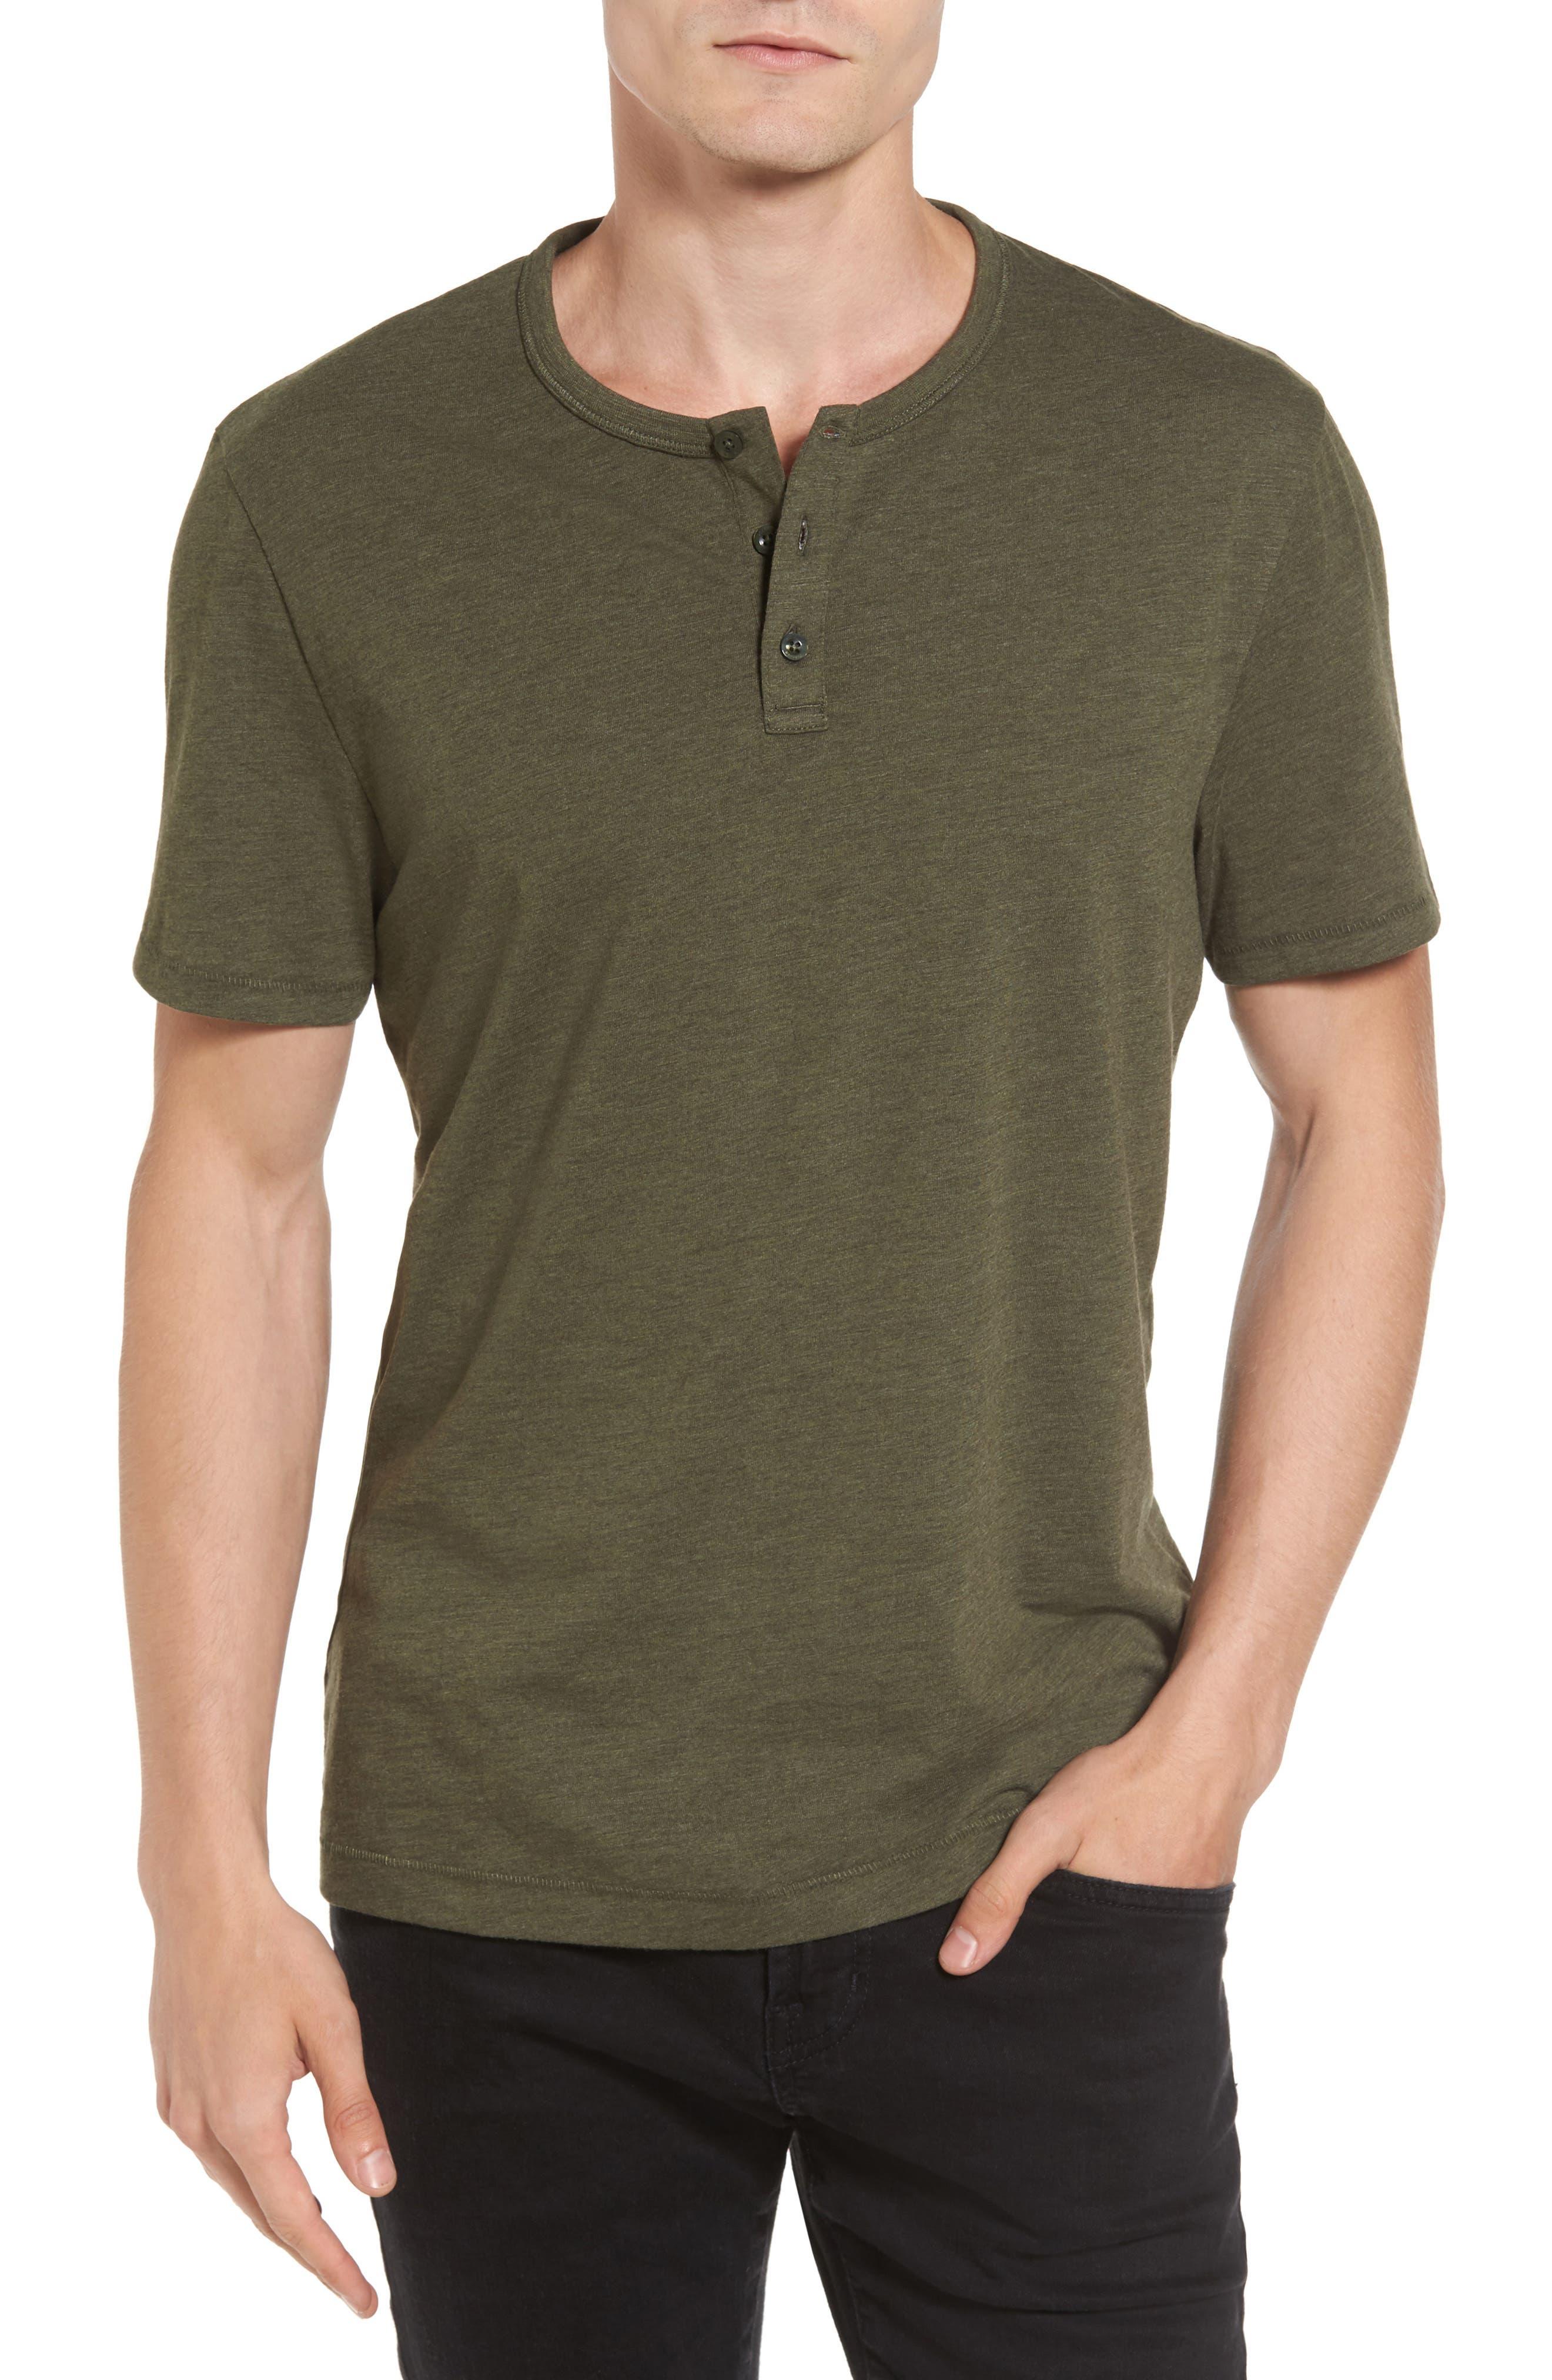 Bing Short Sleeve Henley Shirt,                             Main thumbnail 1, color,                             Forest Night